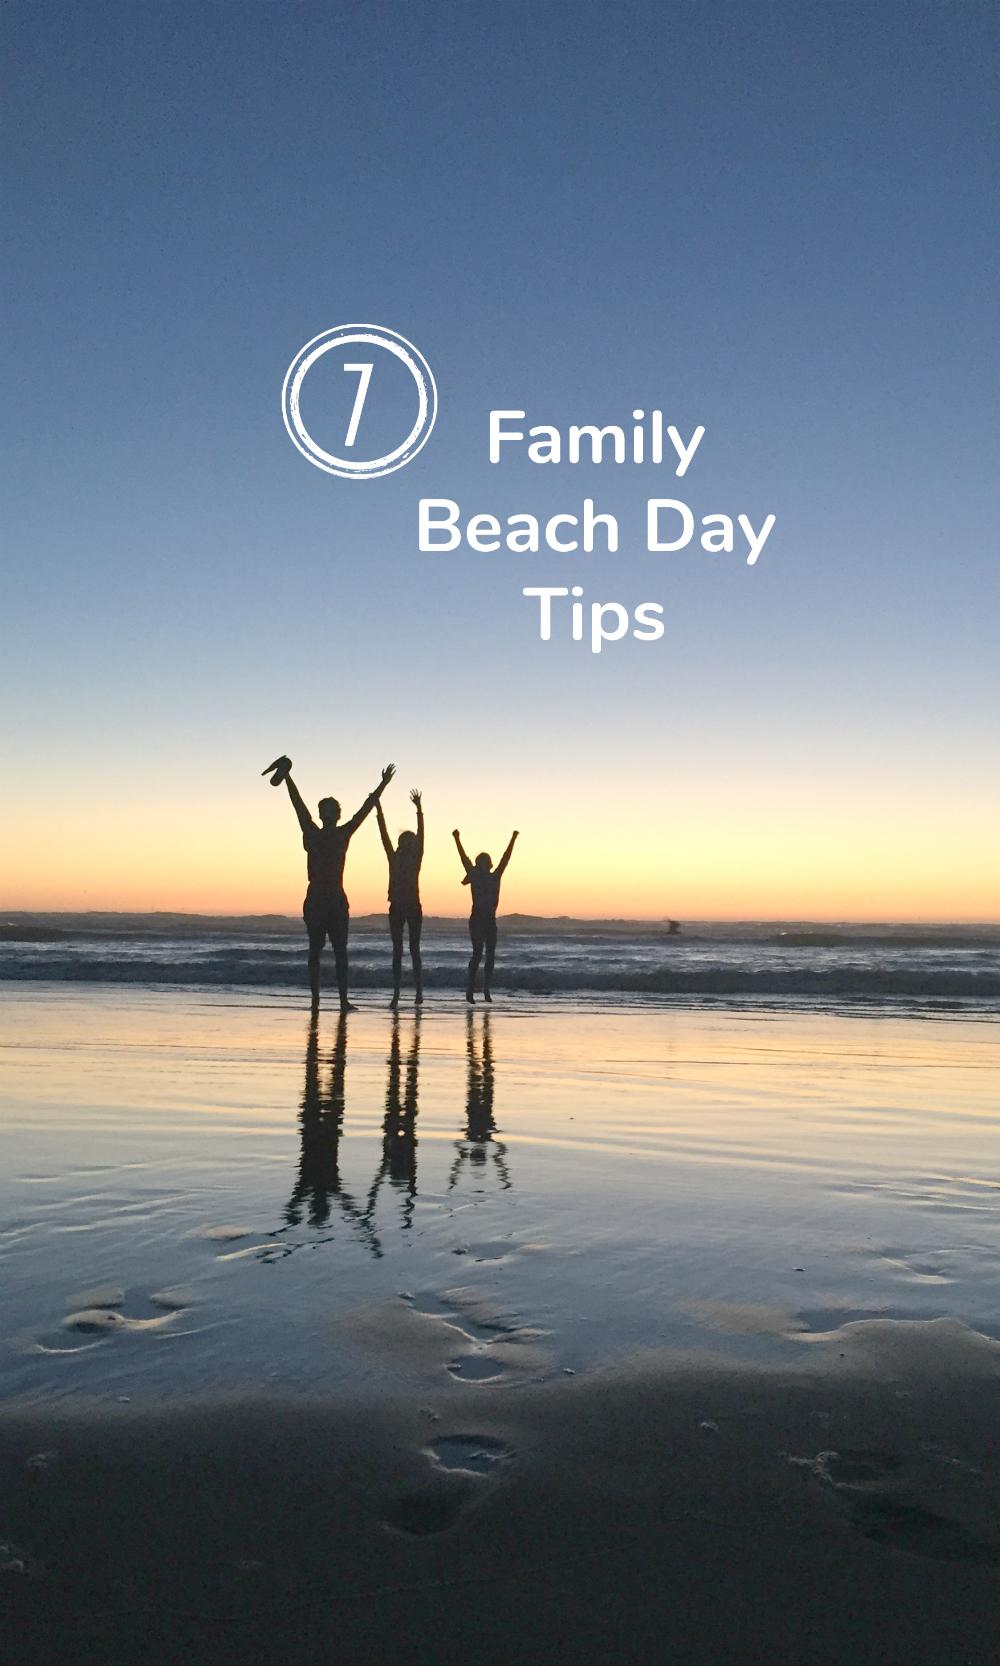 7 Family Beach Day Tips